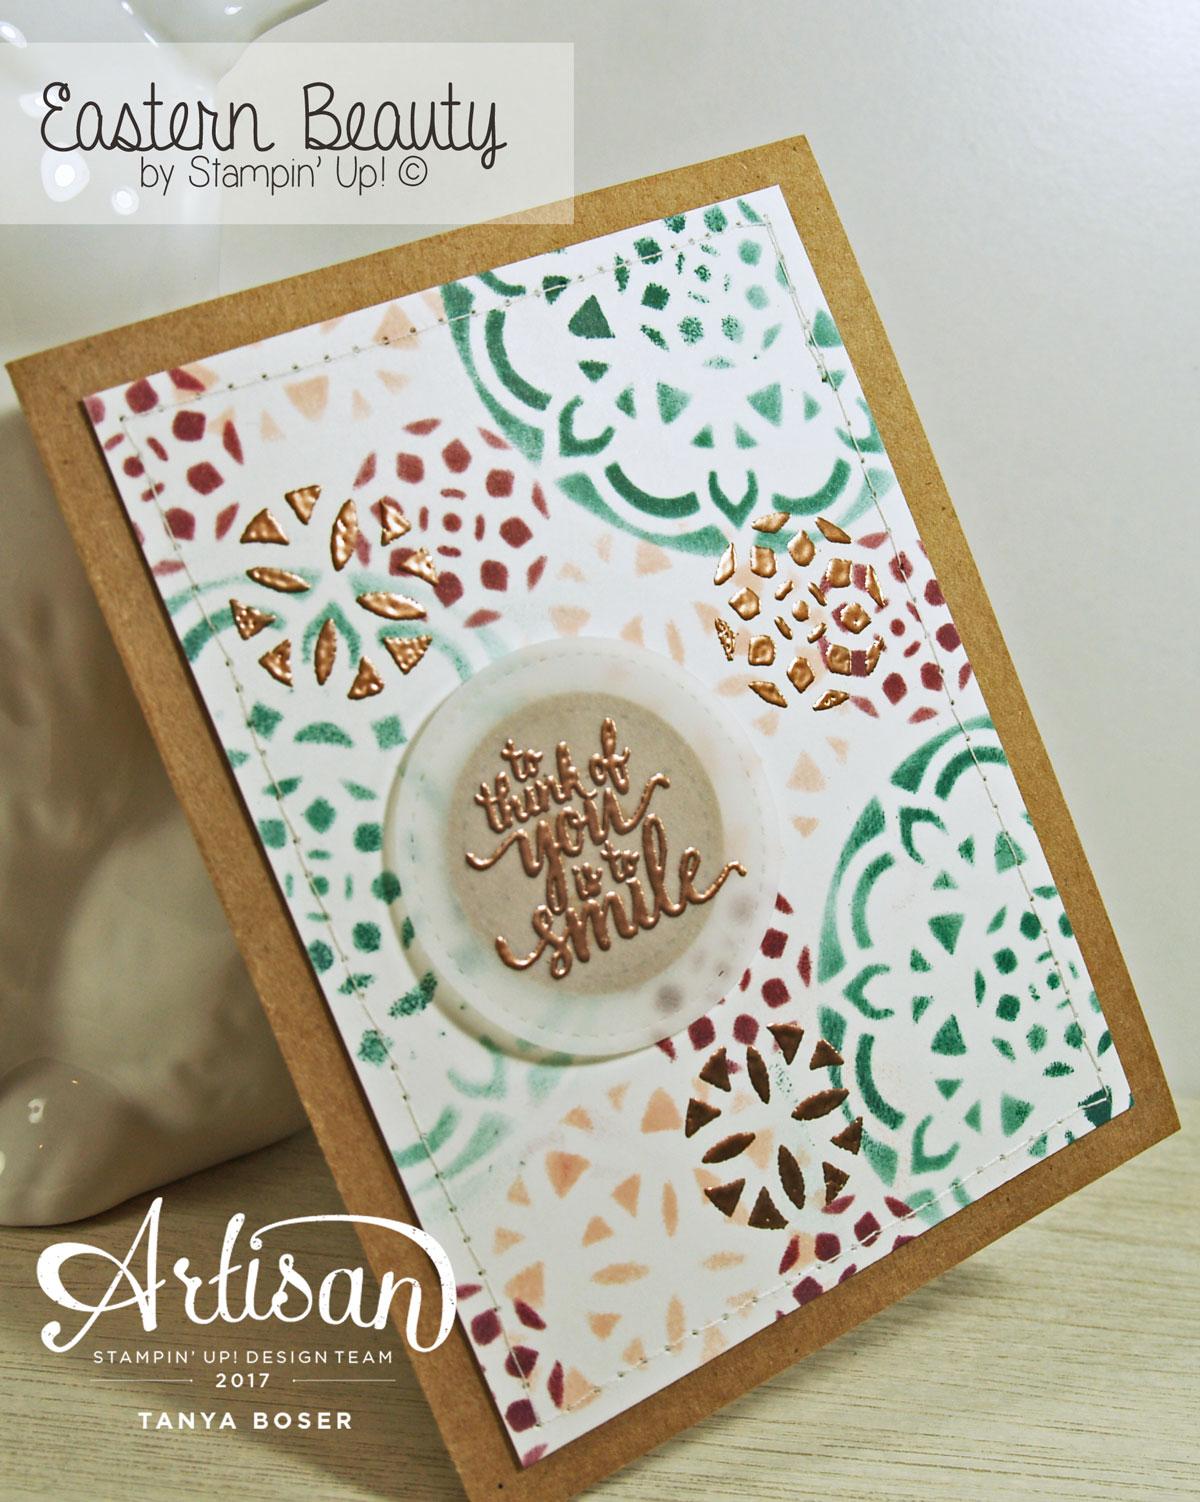 how to use artisan tinker